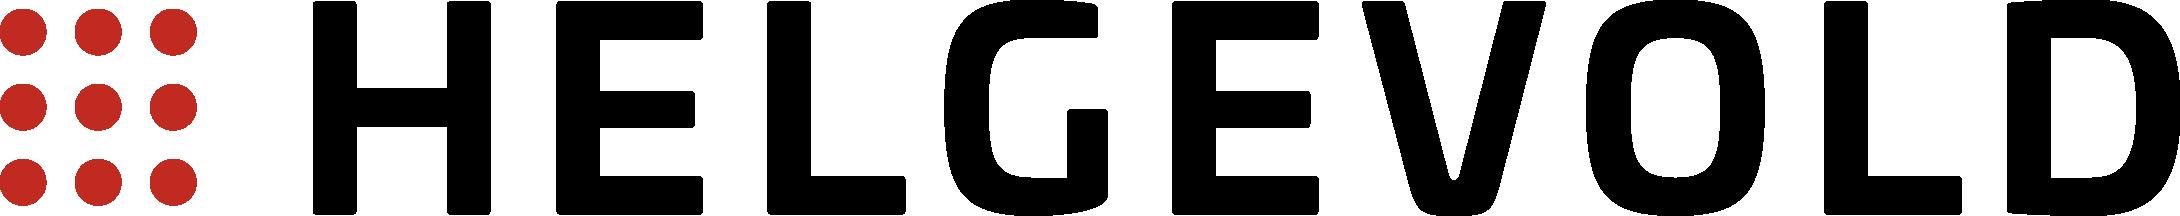 Omega PS logo